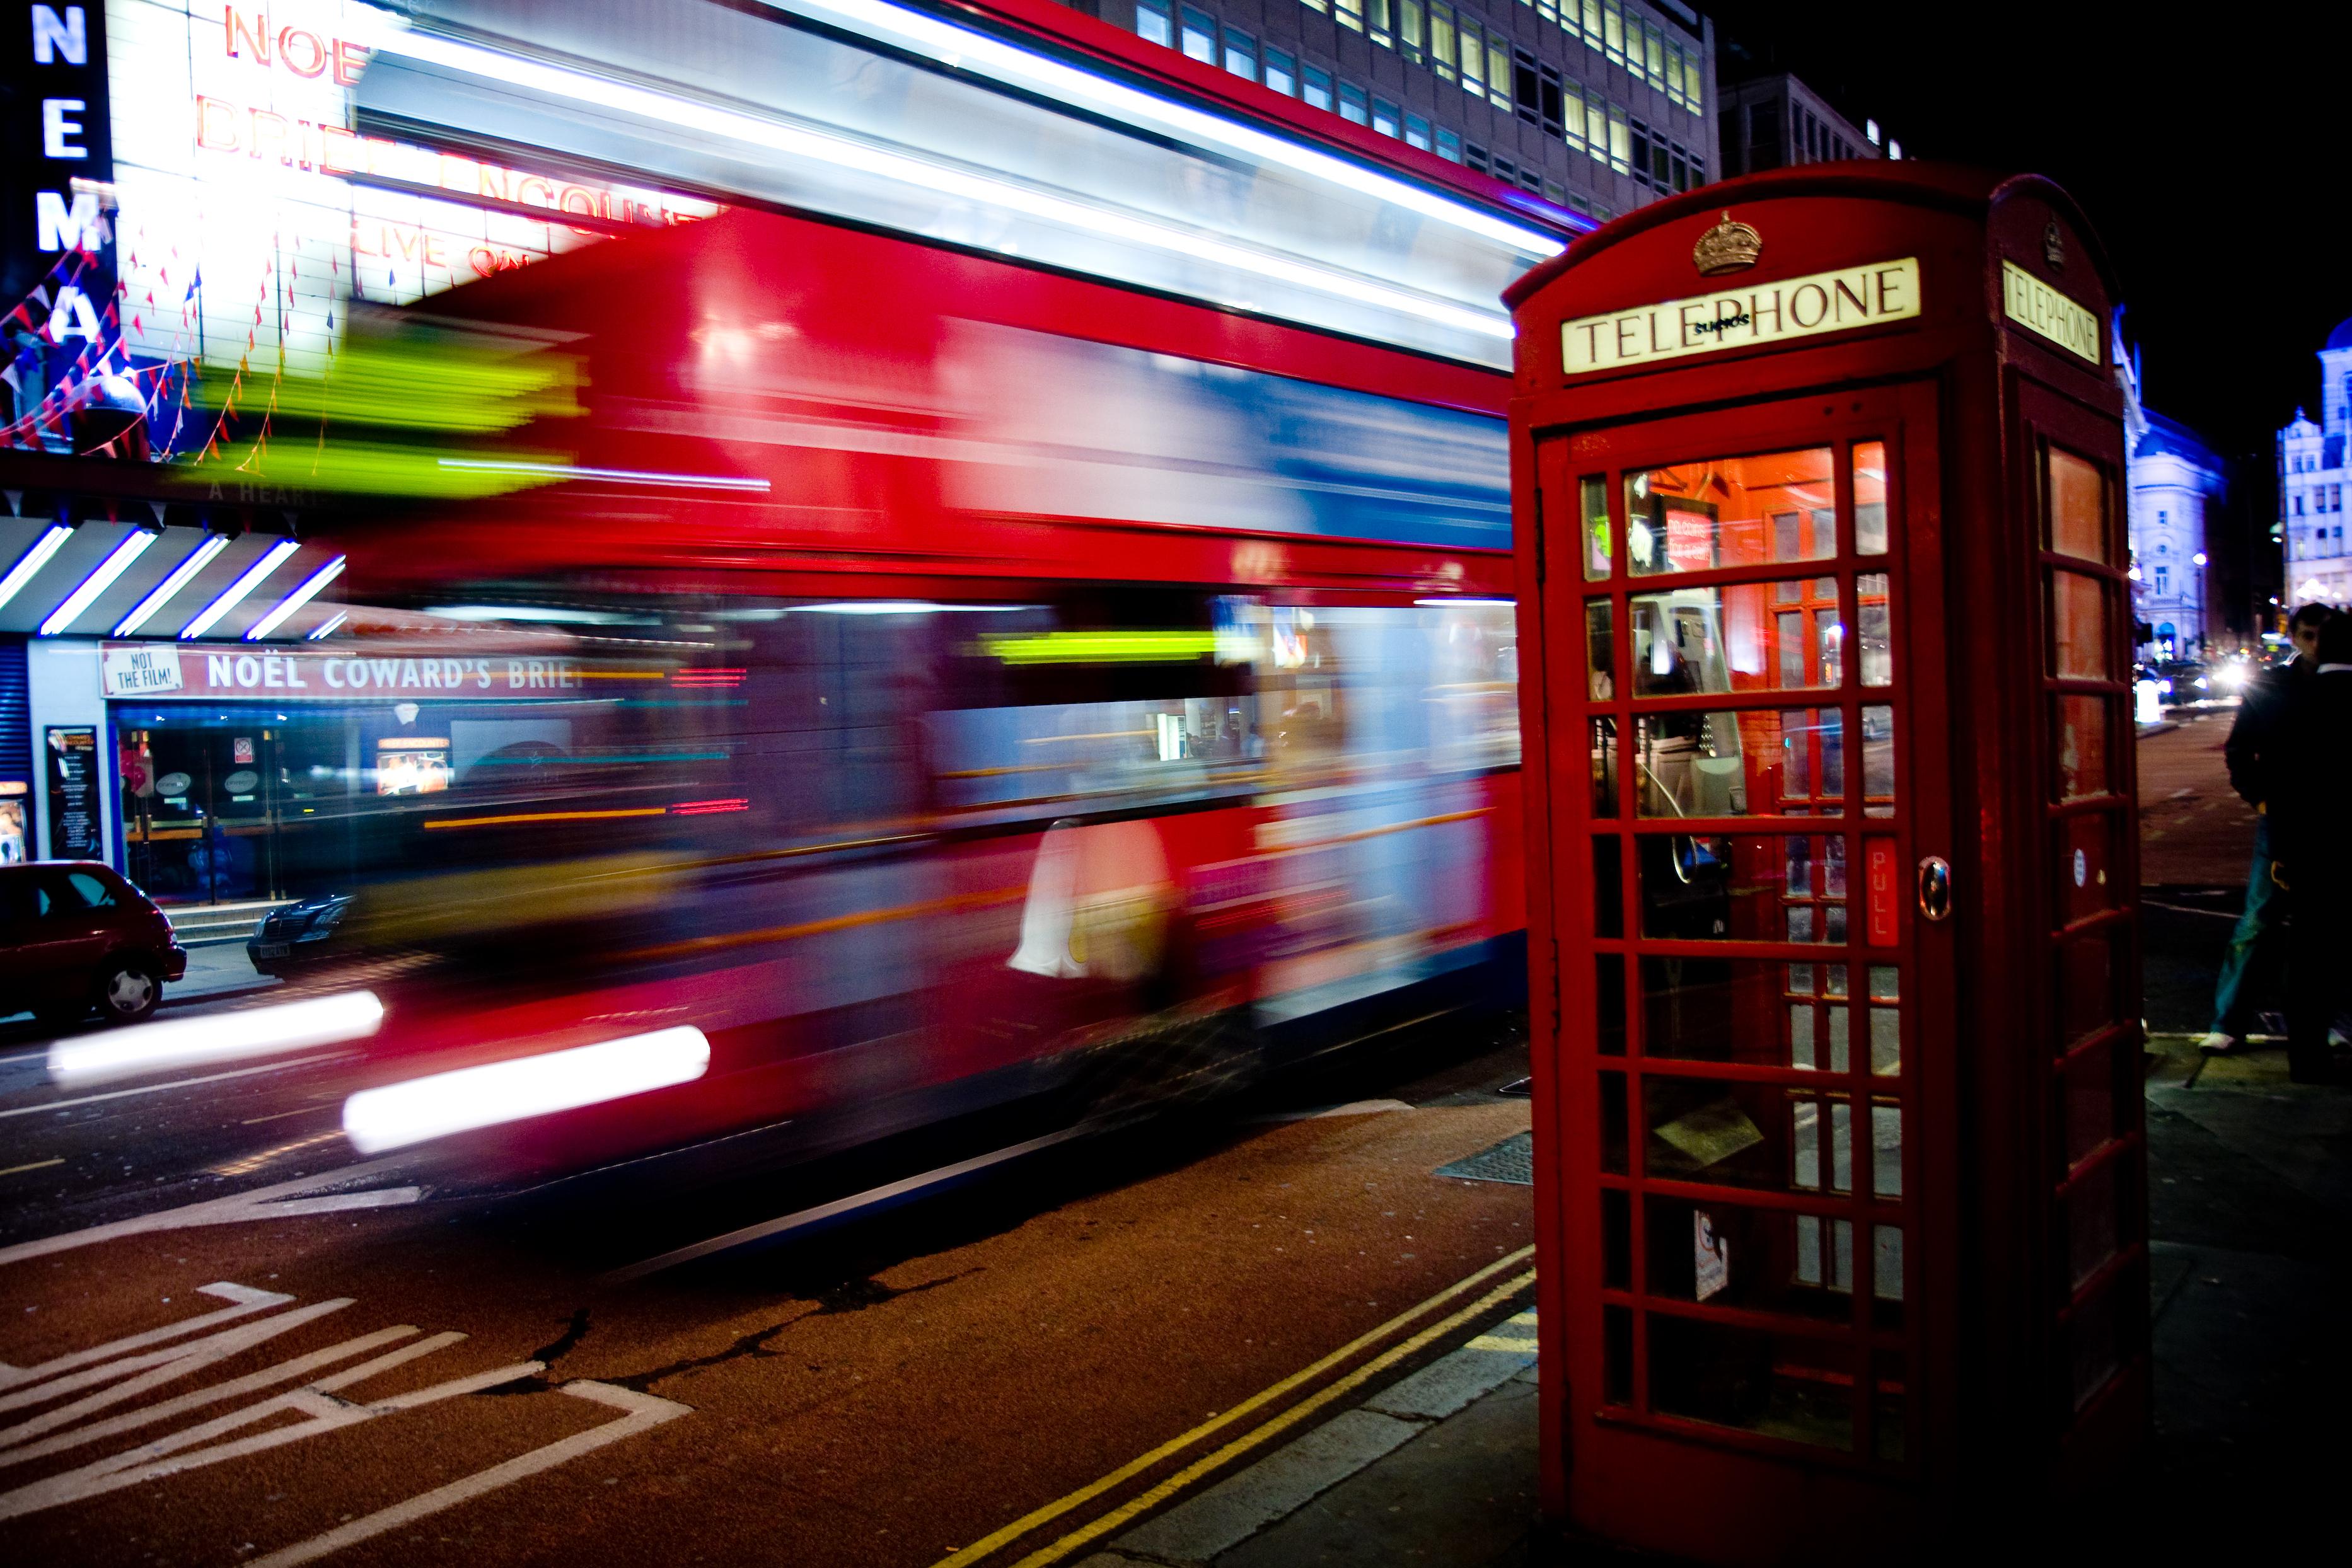 FileLondon bus and telephone box on Haymarketjpg   Wikipedia the 3731x2488